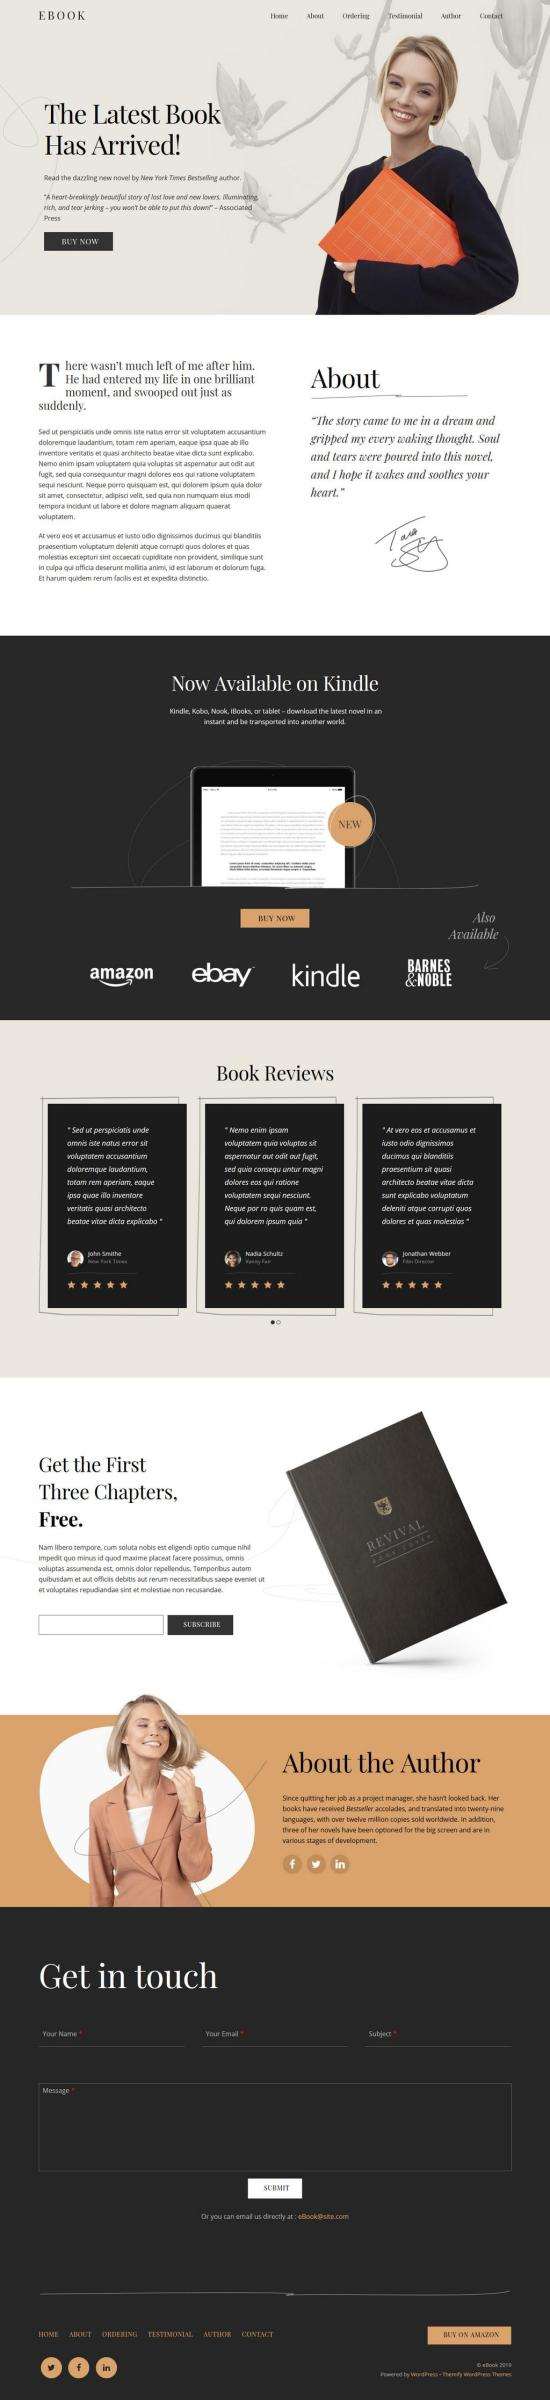 ultra book wordpress theme 01 - Ultra Book WordPress Theme